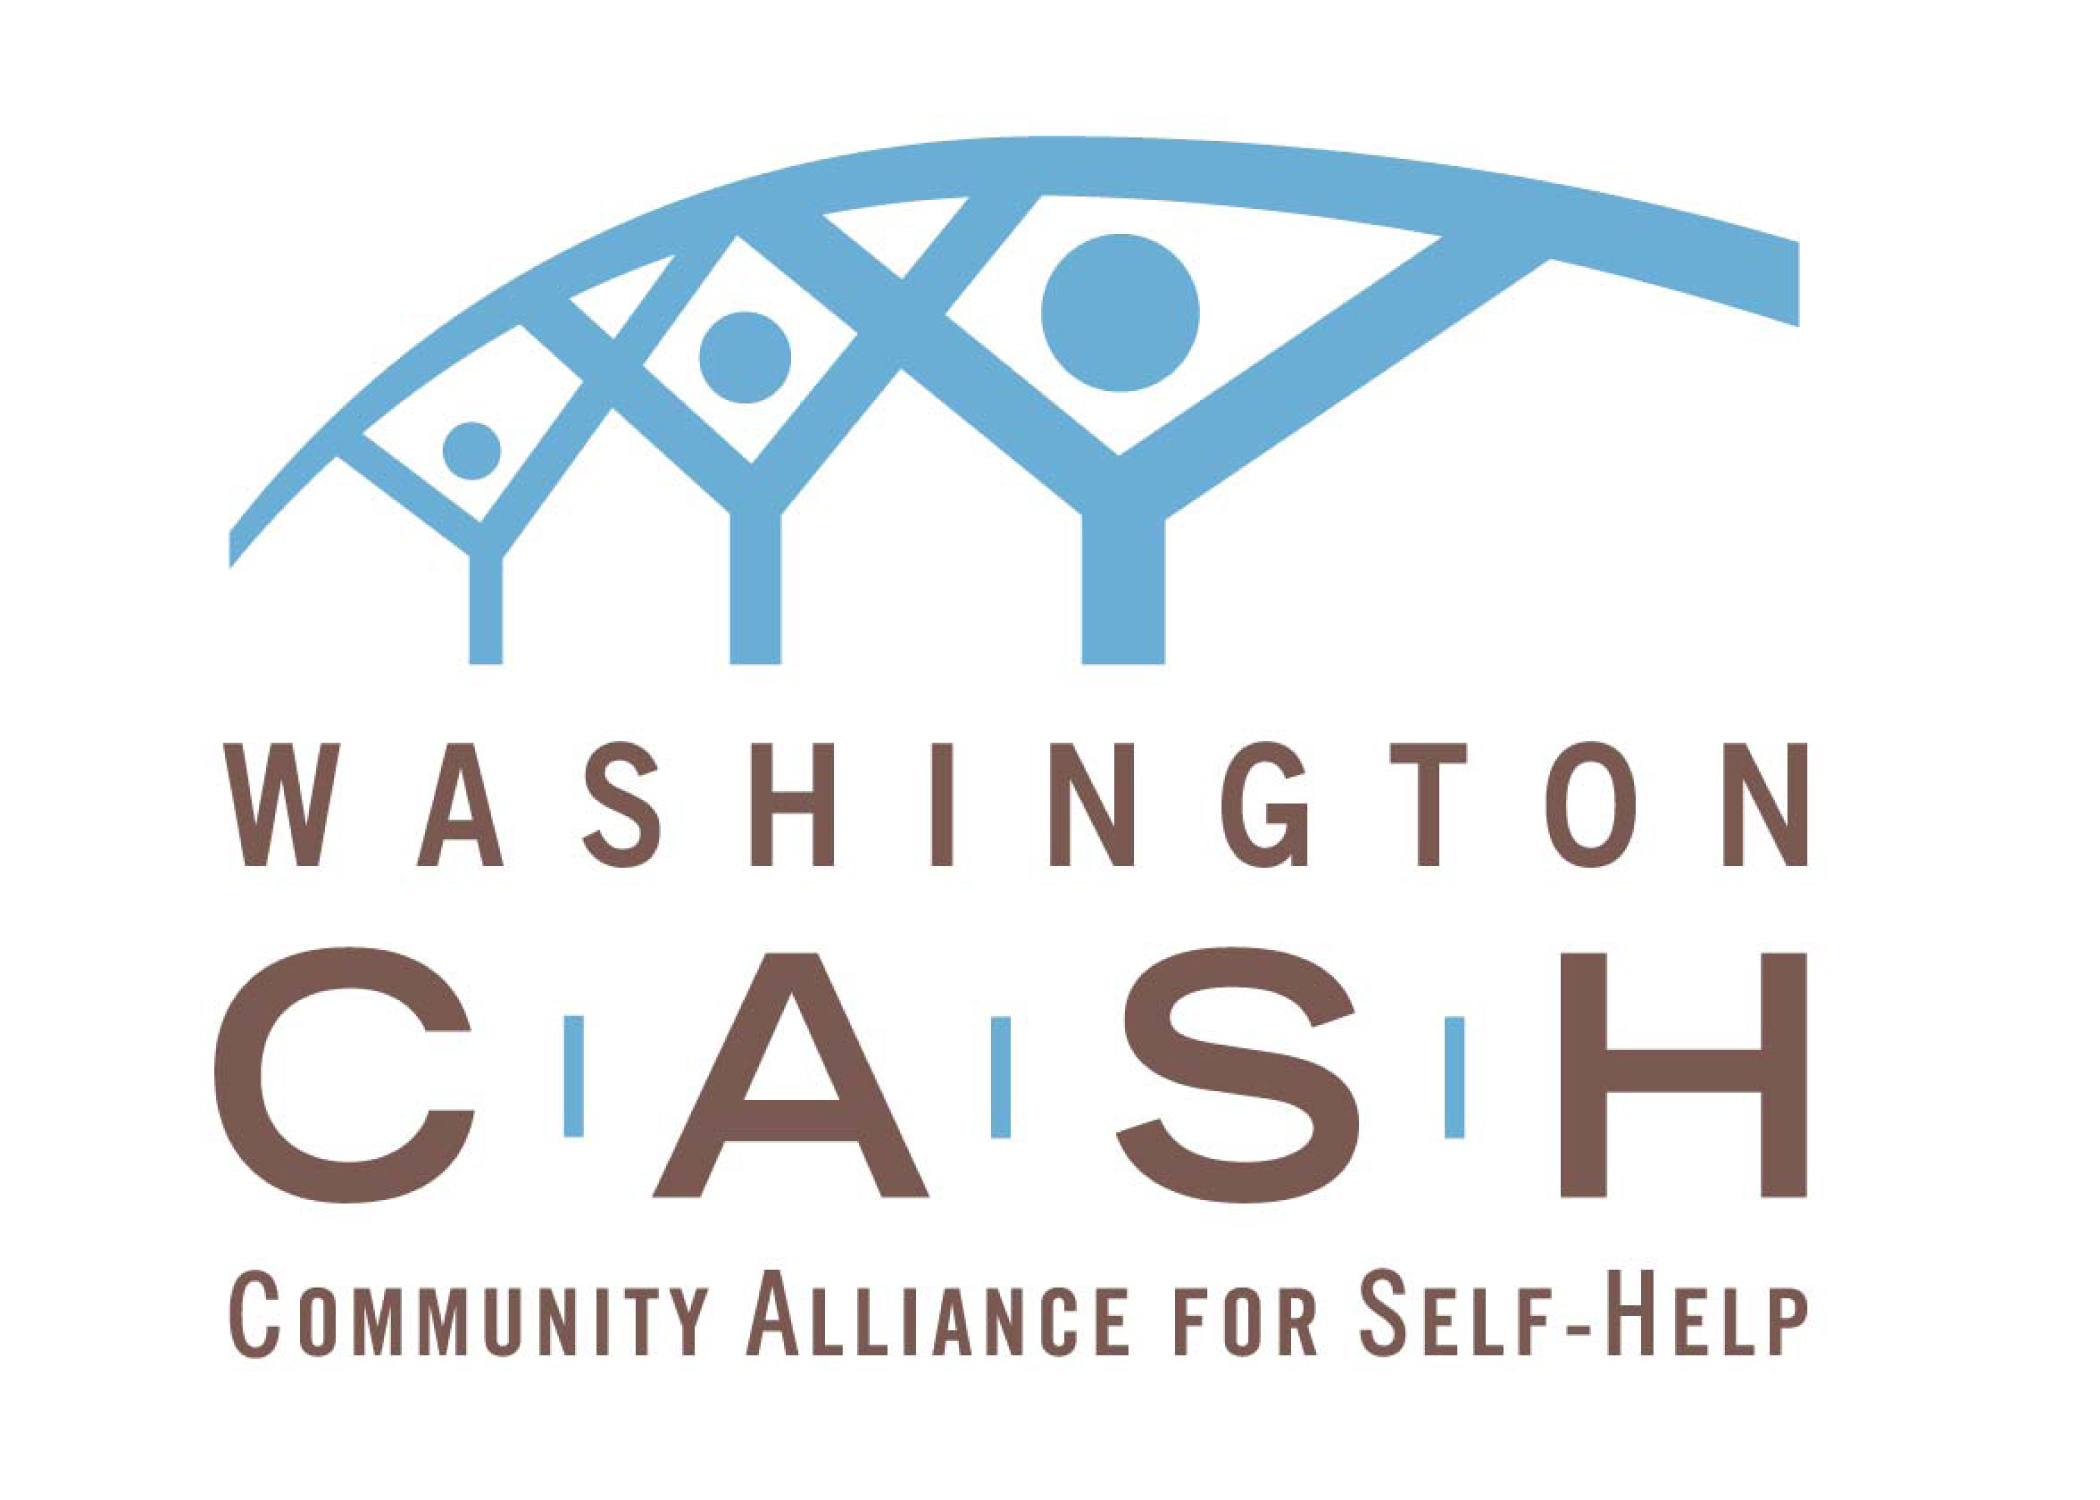 Washington CASH